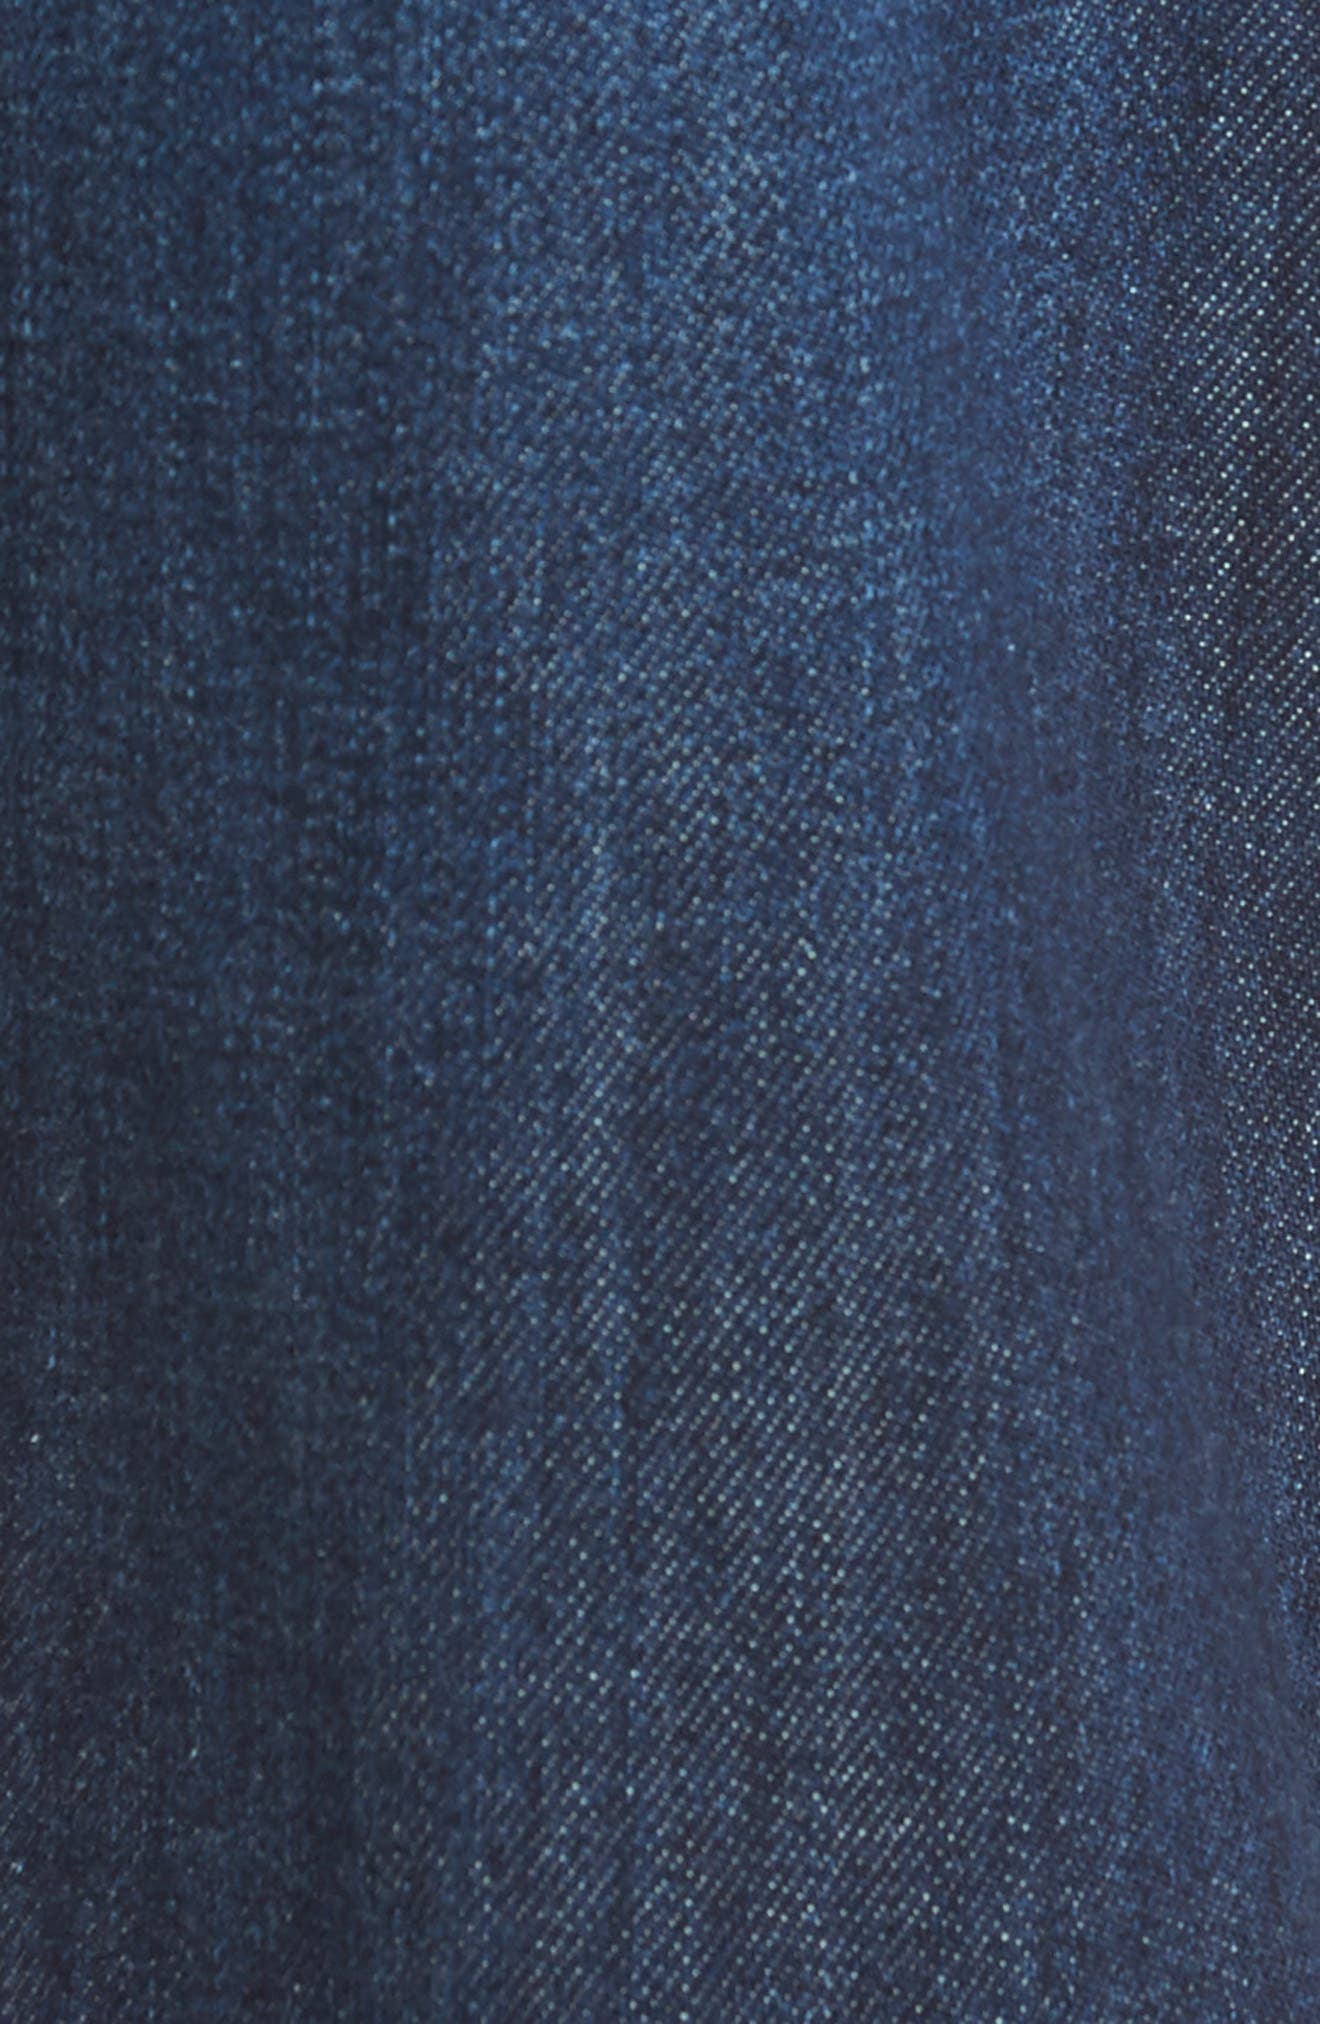 Graduate Slim Straight Leg Jeans,                             Alternate thumbnail 5, color,                             477